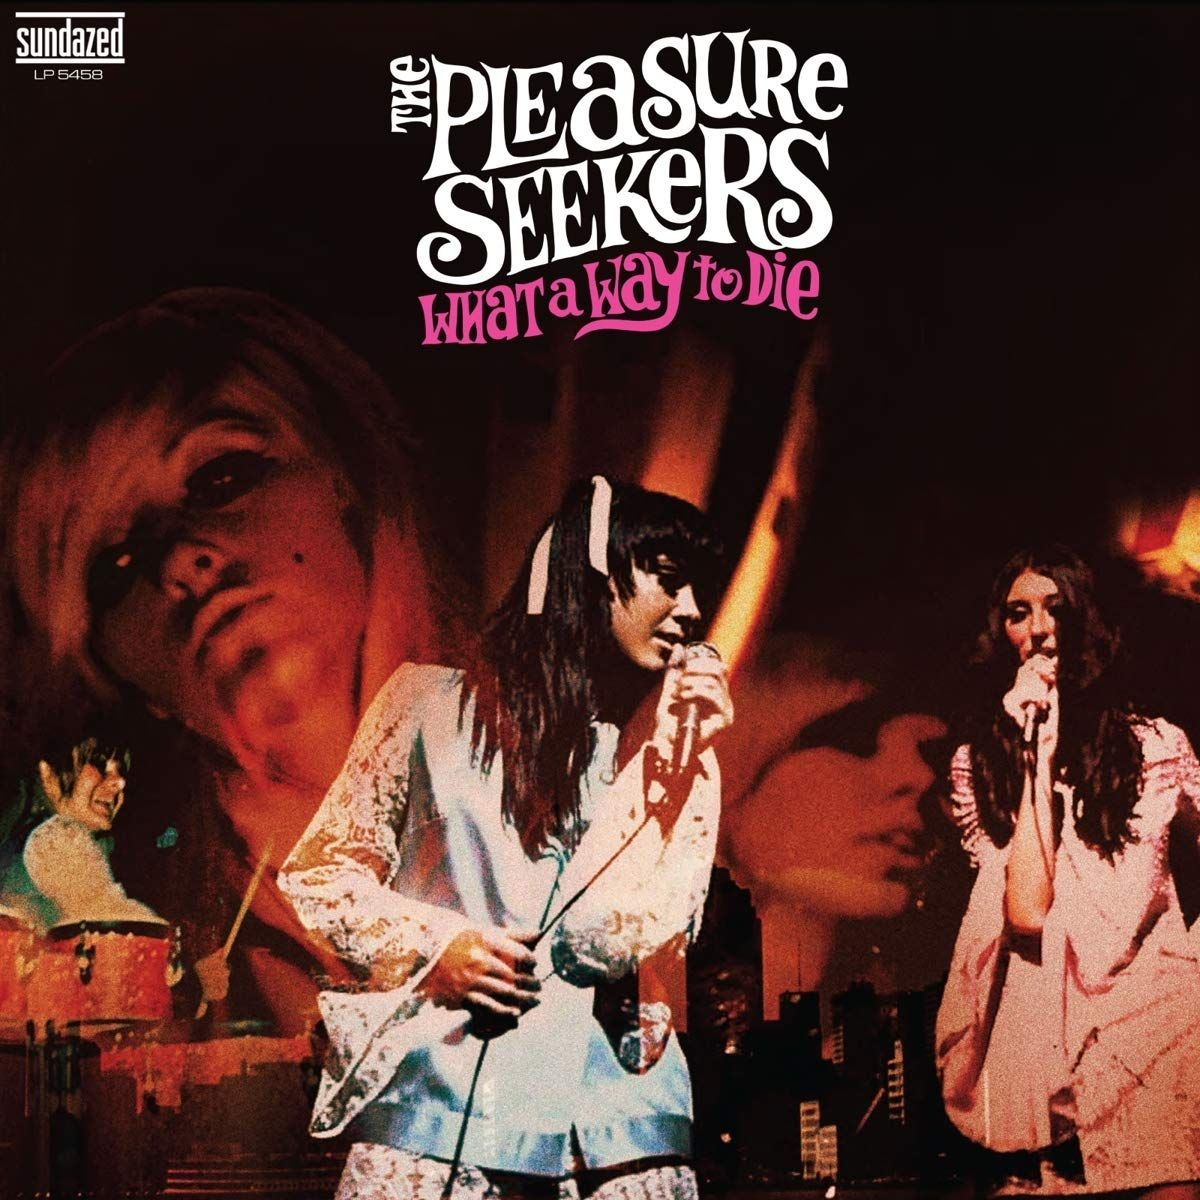 #PittigeMadammen - The Pleasure Seekers - What A Way To Die (1965)